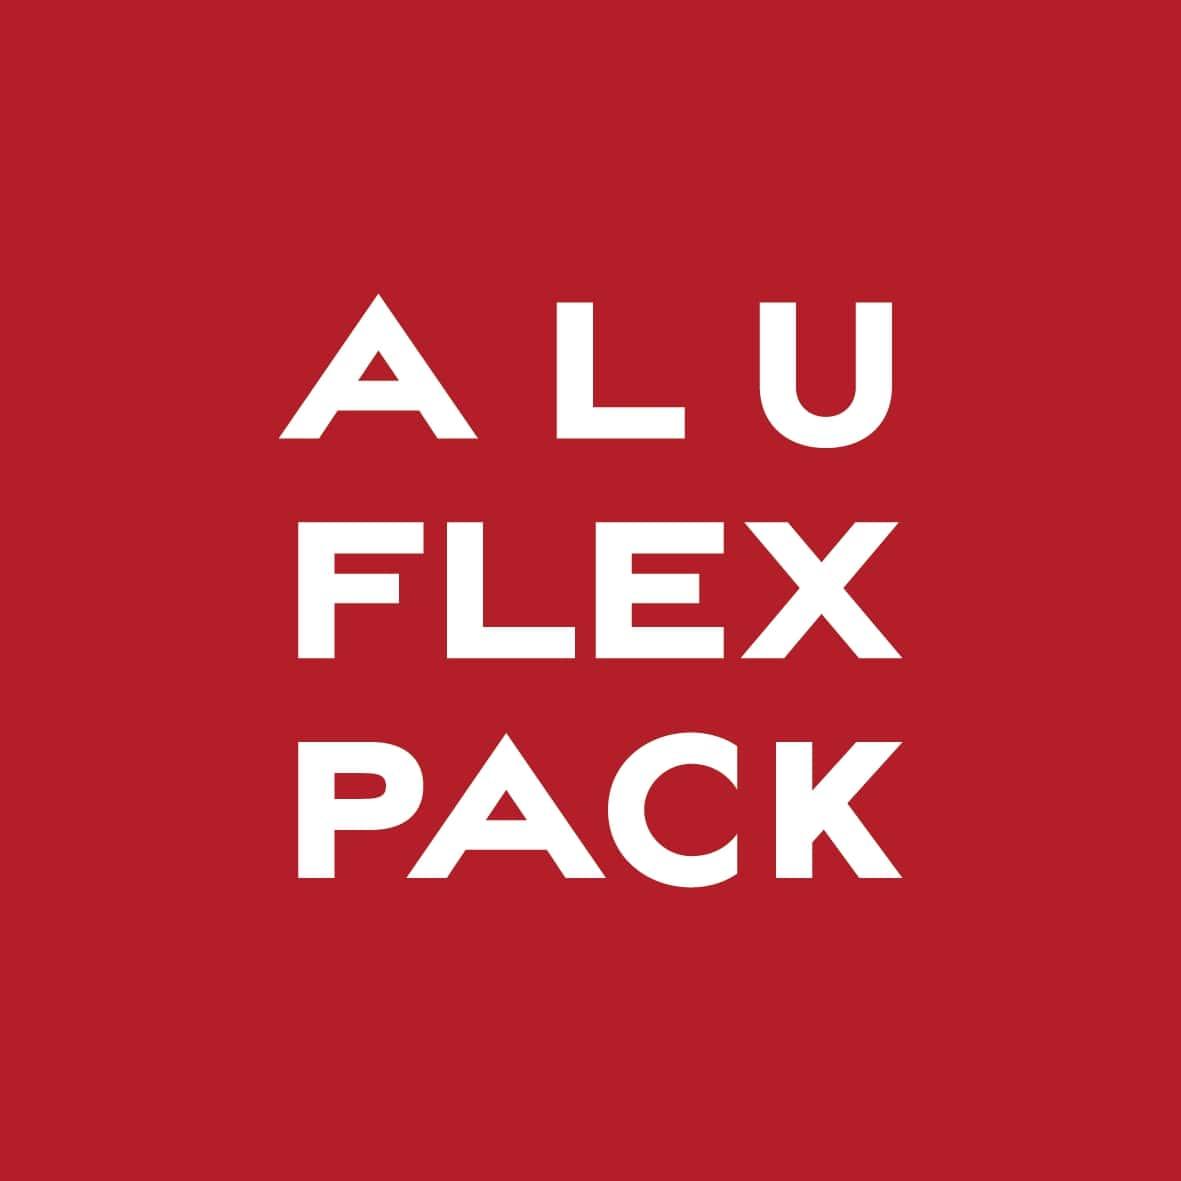 Aluflexpack